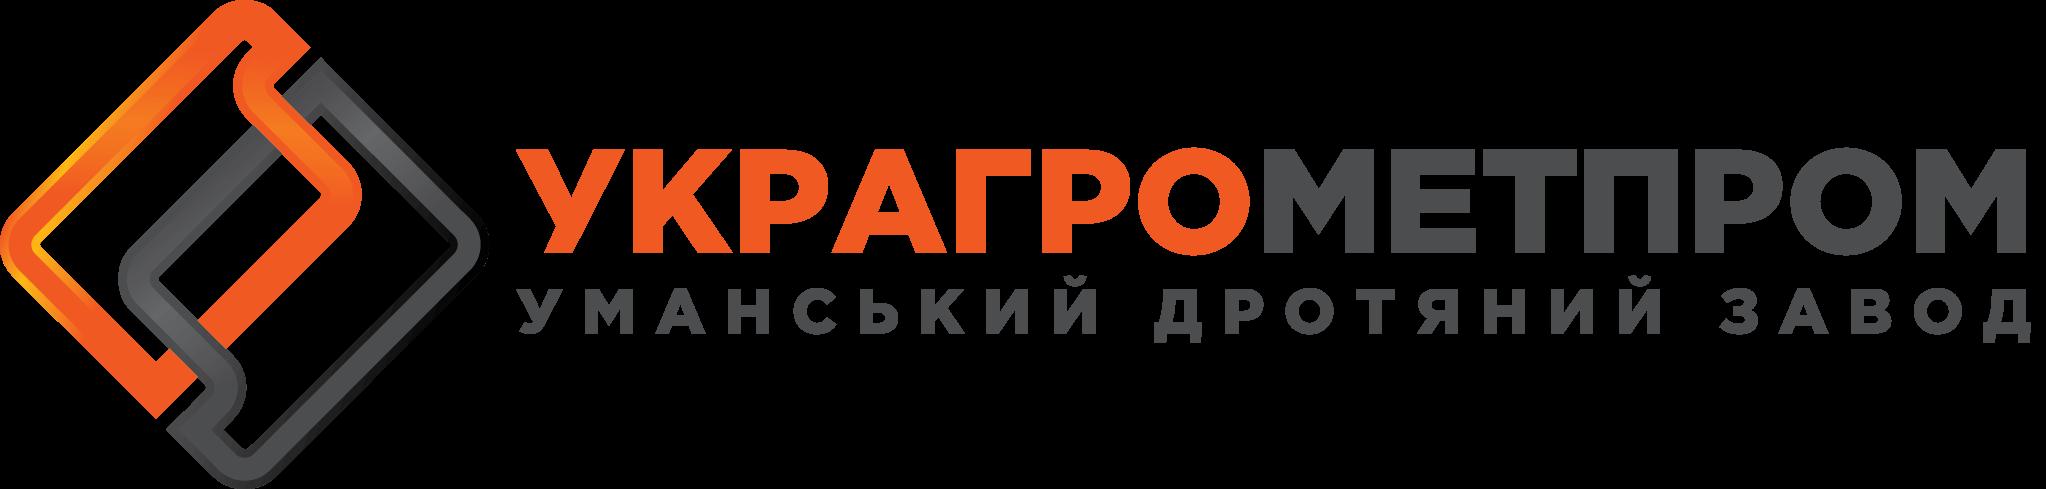 УКРАГРОМЕТПРОМ